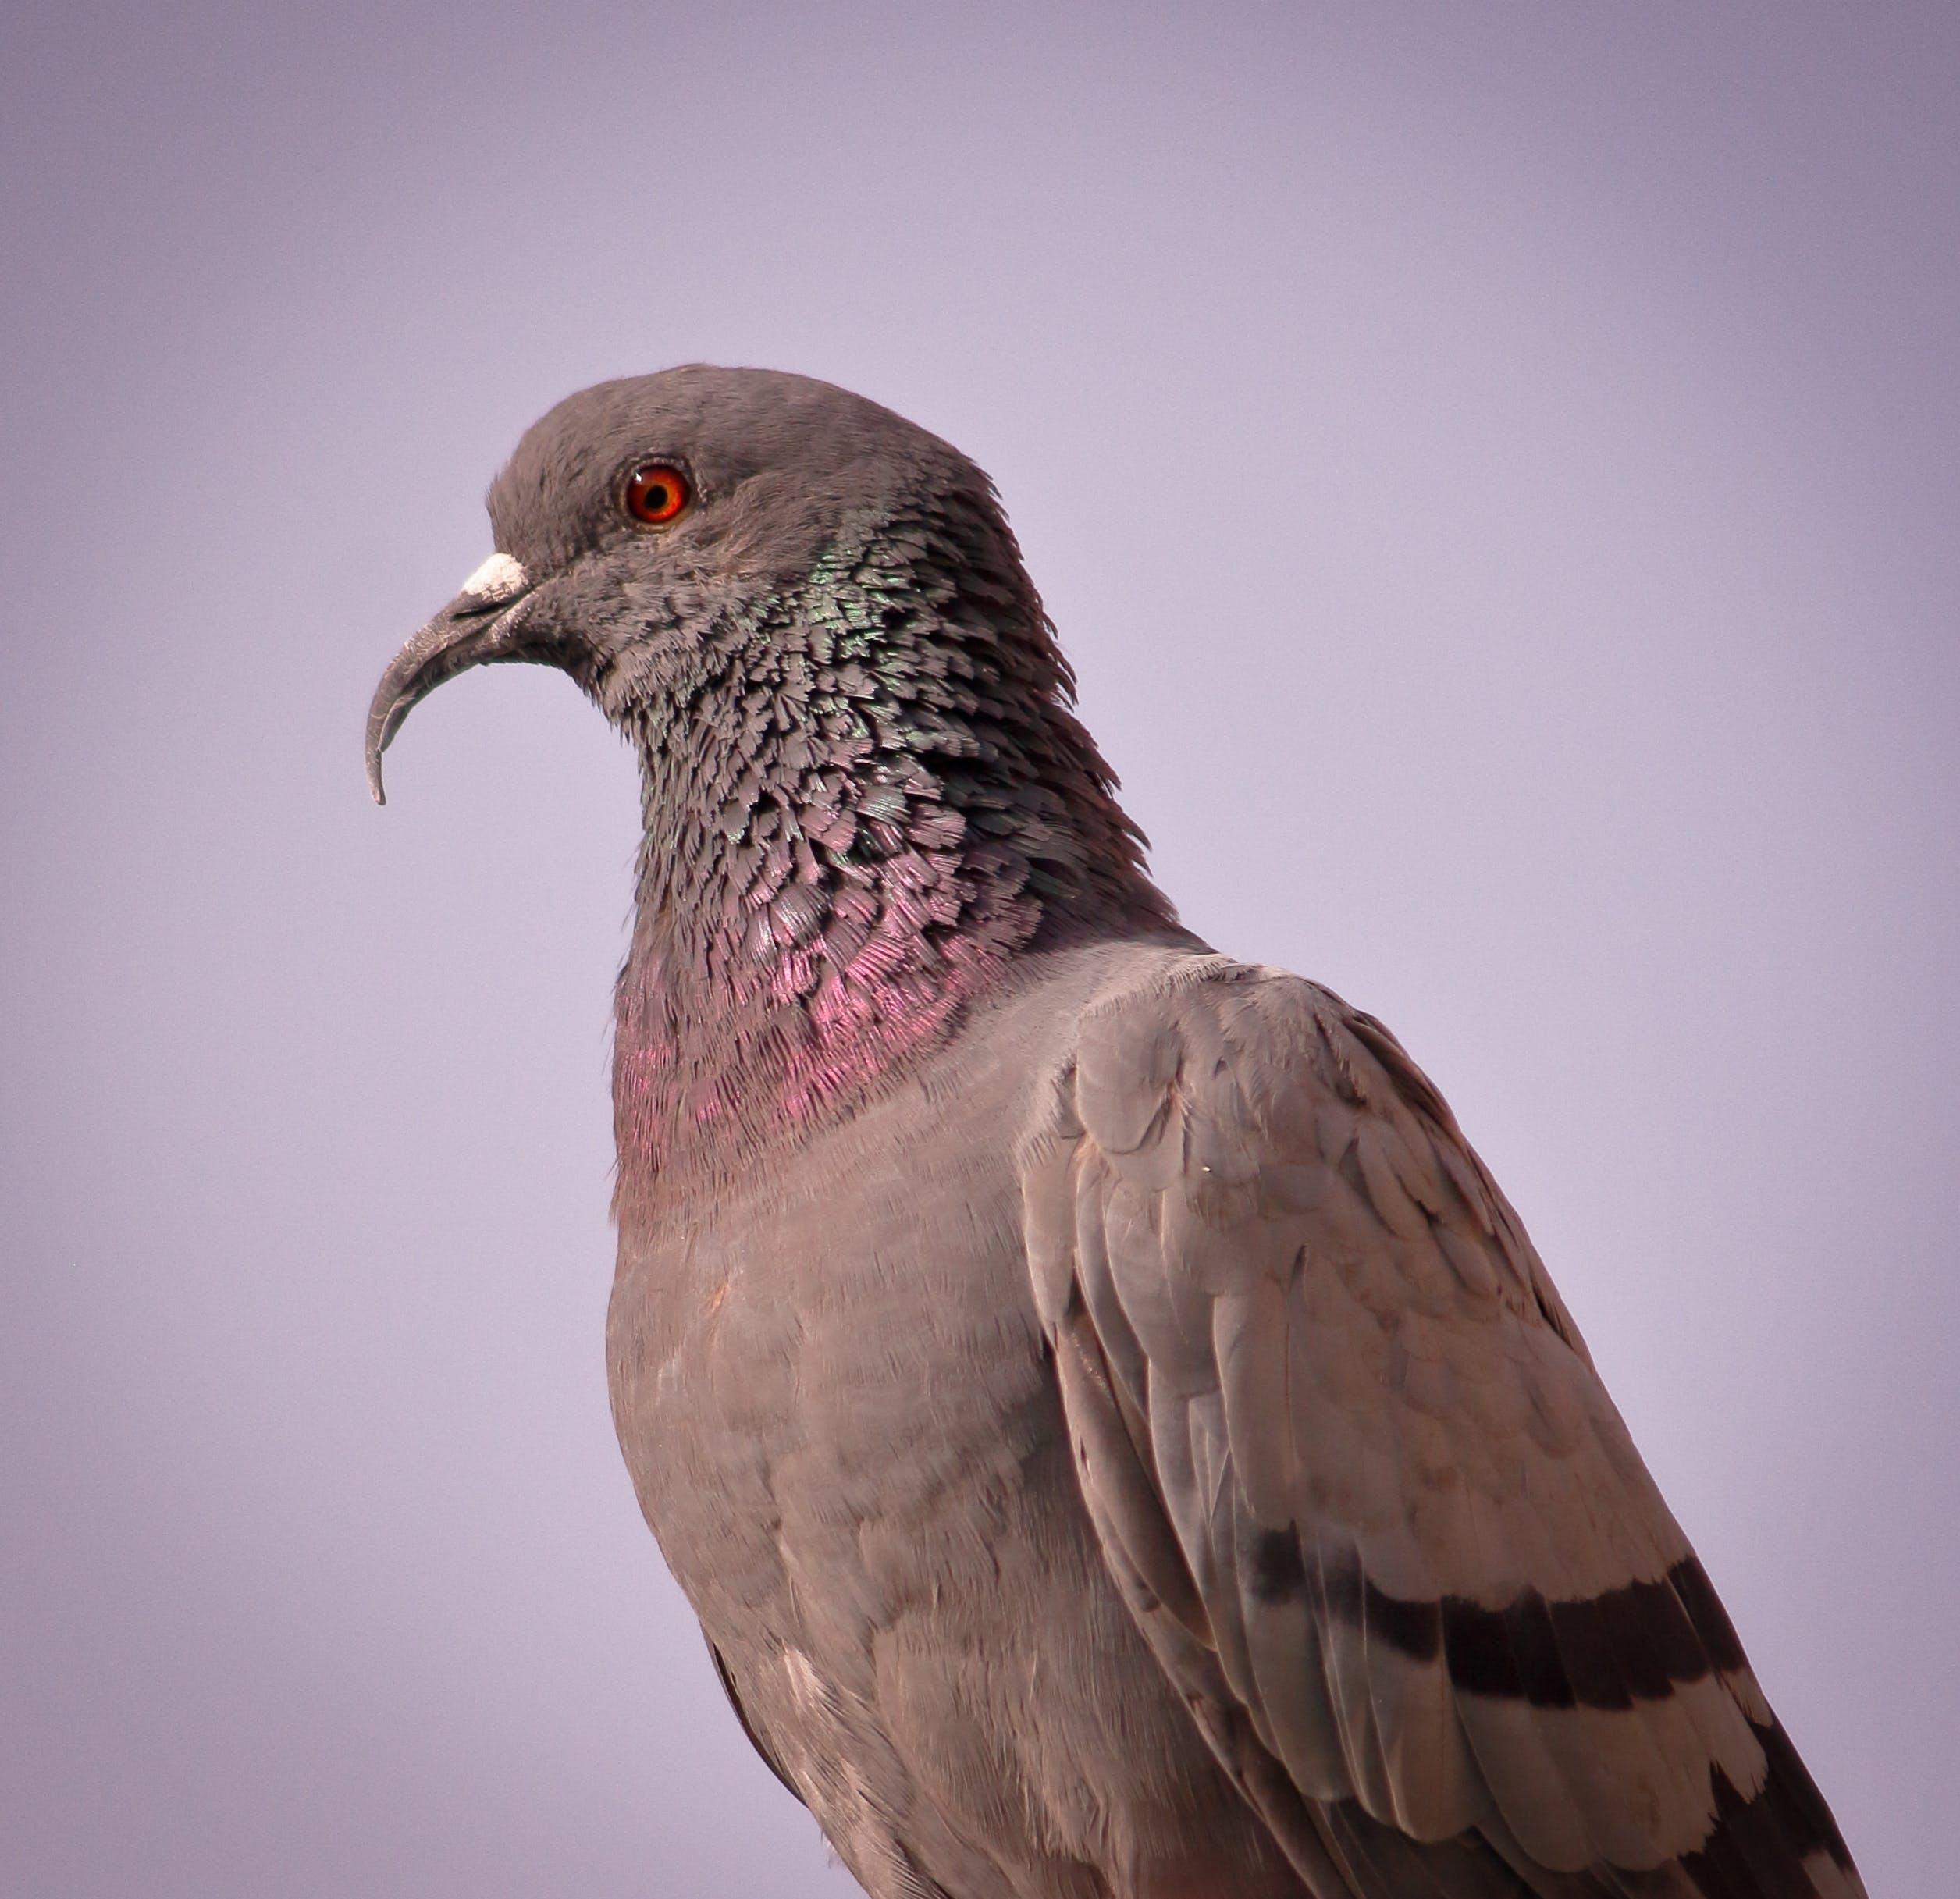 Foto d'estoc gratuïta de #photography #photooftheday #photographyislife #ph, #pigeonmurah #pigeonfeedingset #pigeonindonesia #p